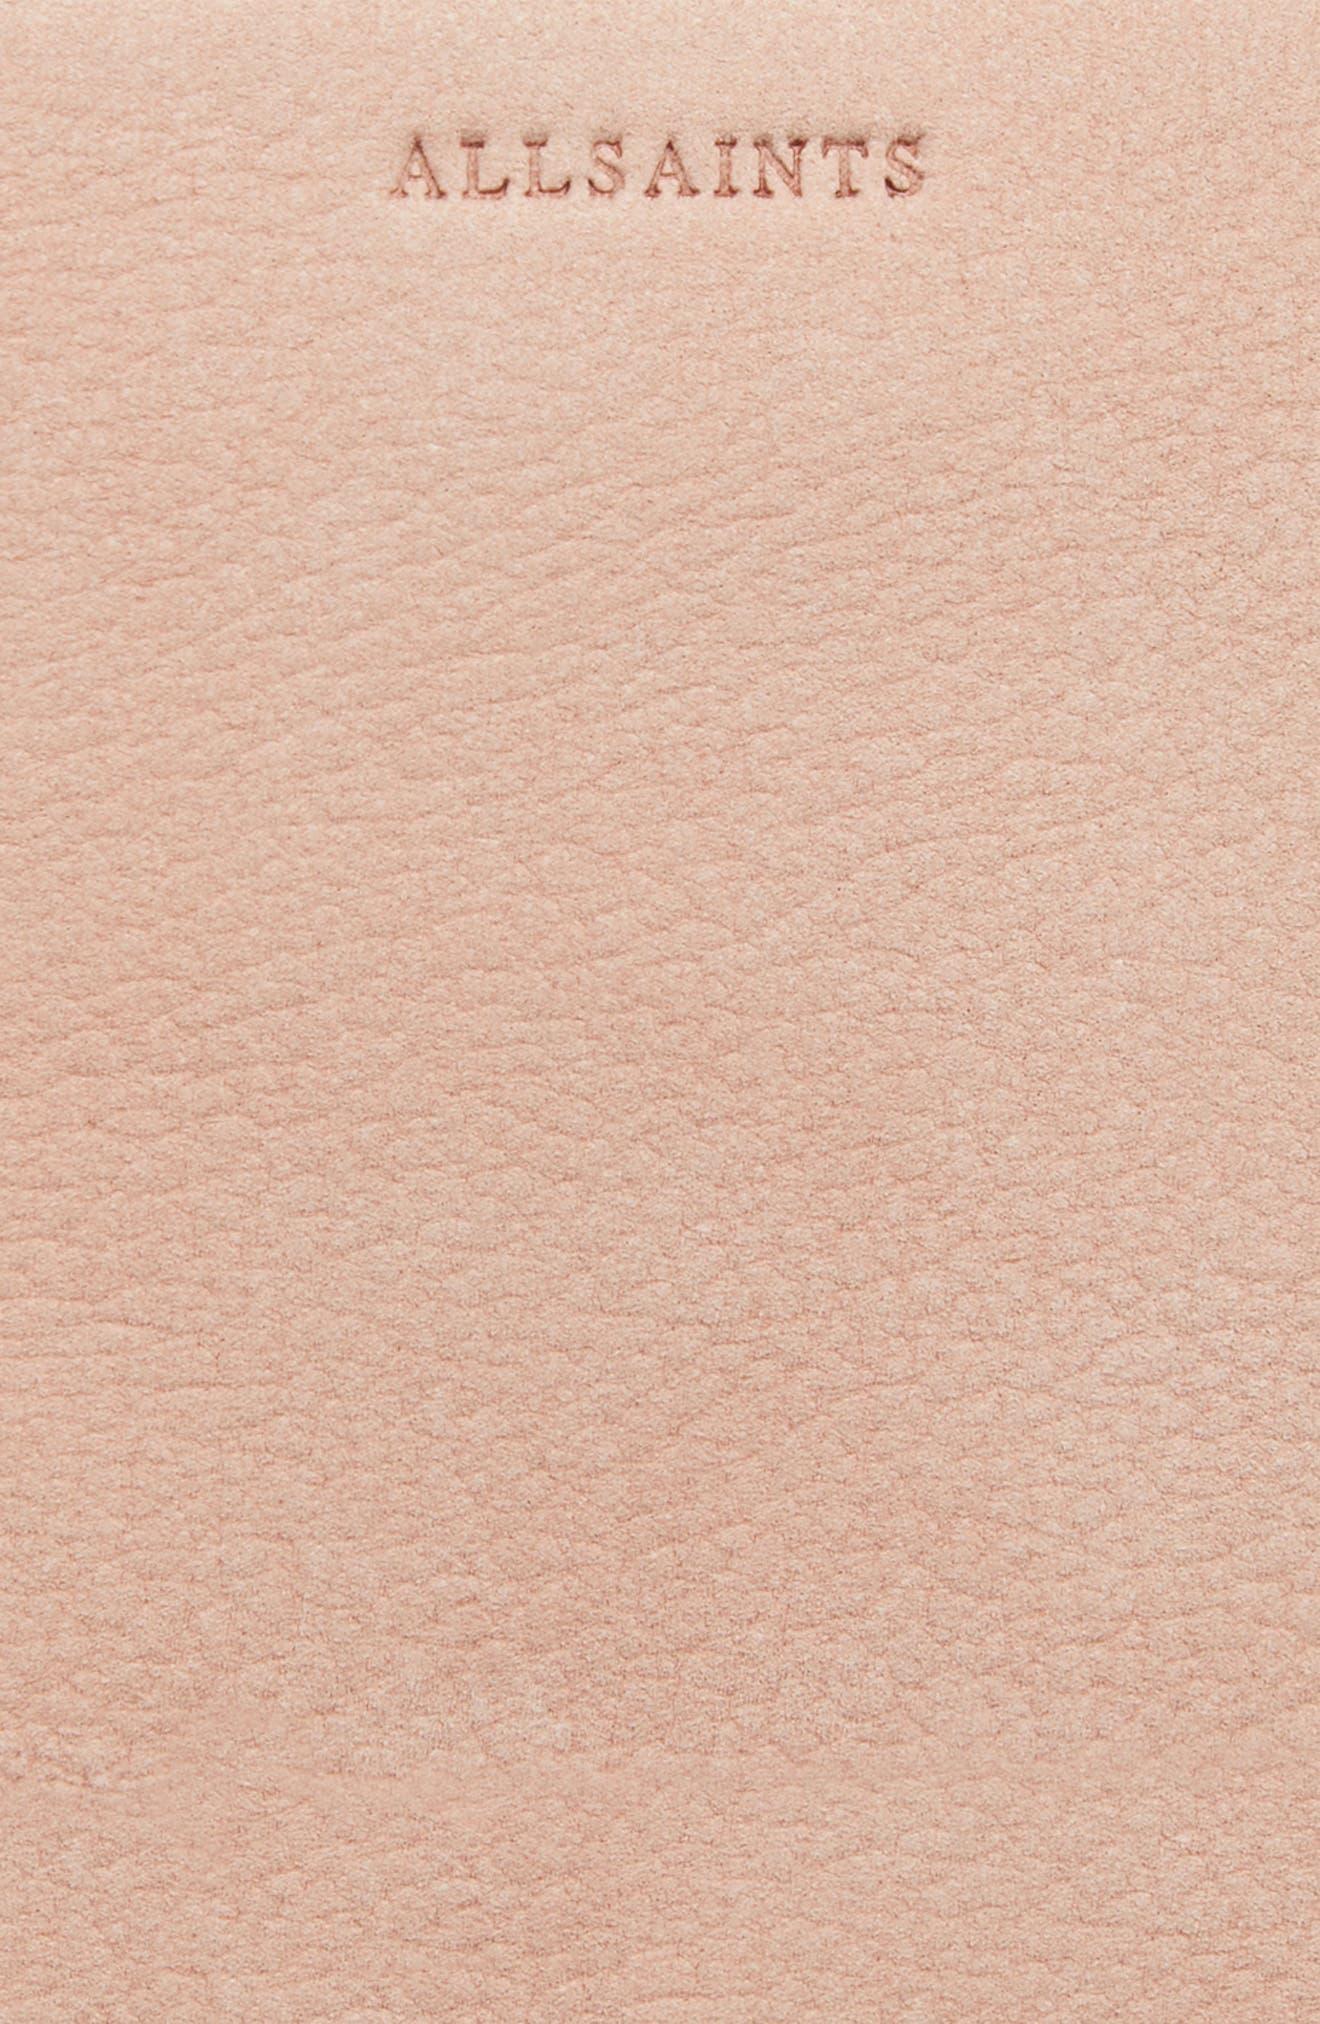 Mini Mast Leather North/South Tote,                             Alternate thumbnail 8, color,                             681